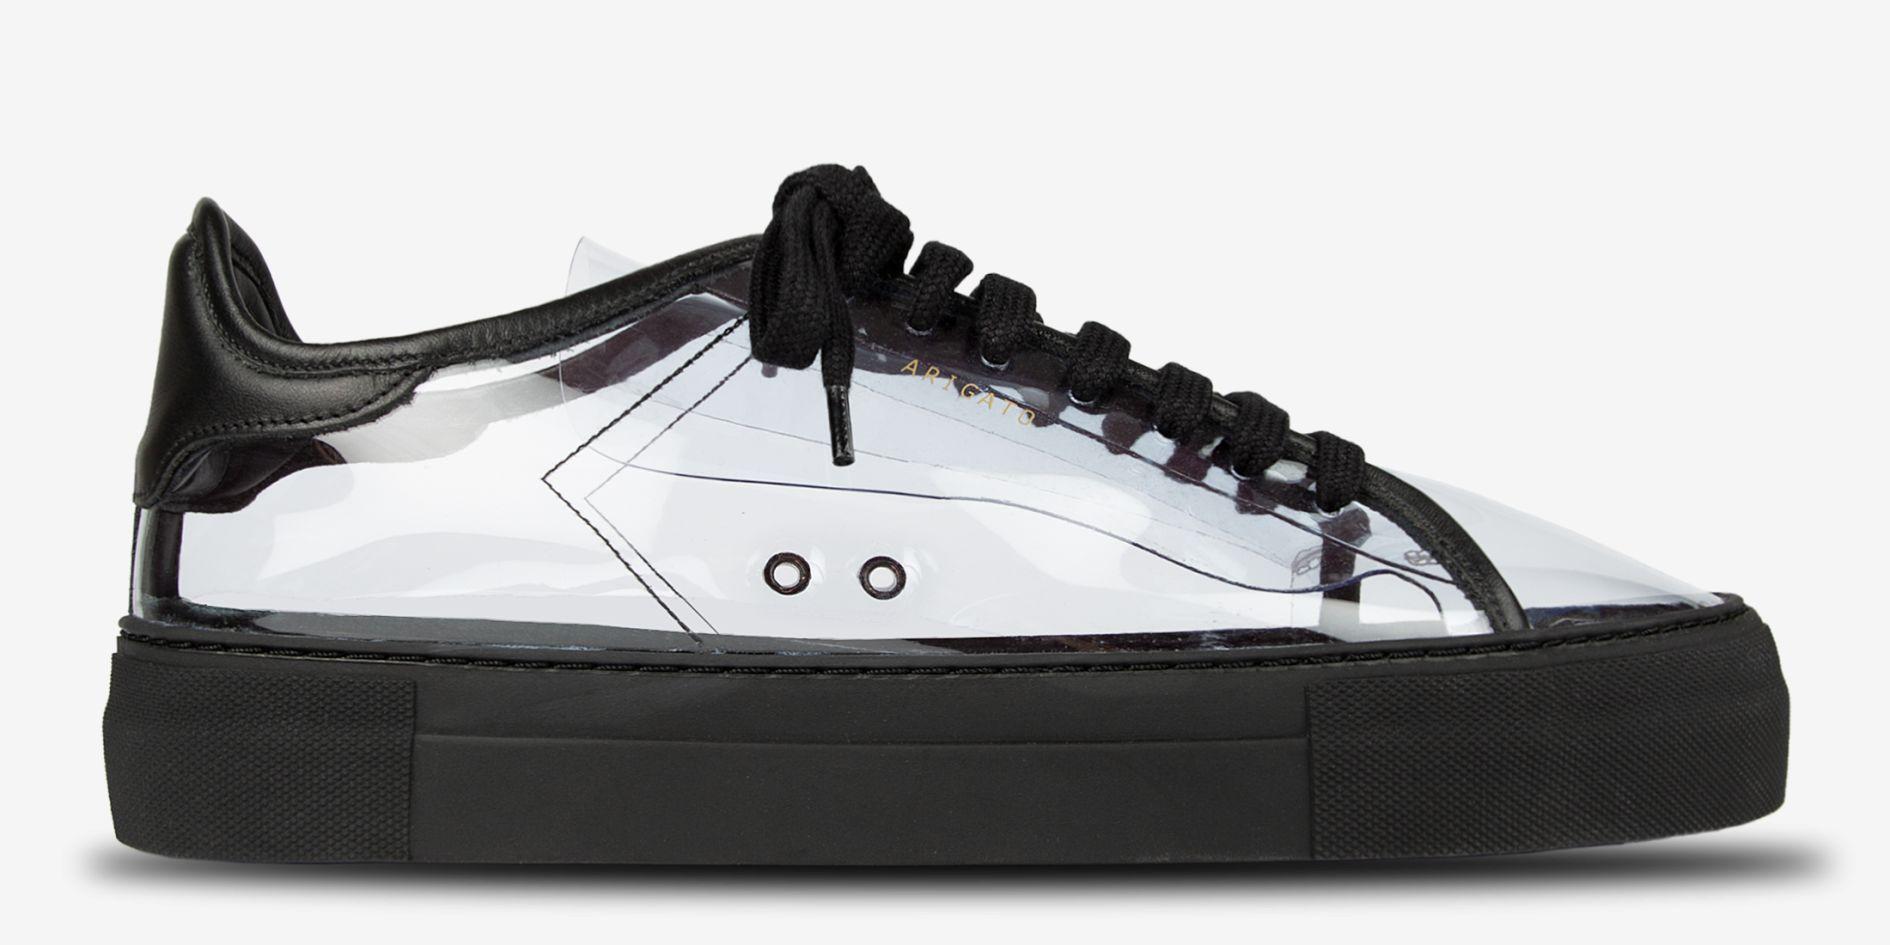 964abed3ef0c AXEL ARIGATO - Axel Arigato x Samsung Clean 360 Sneaker Transparent ...